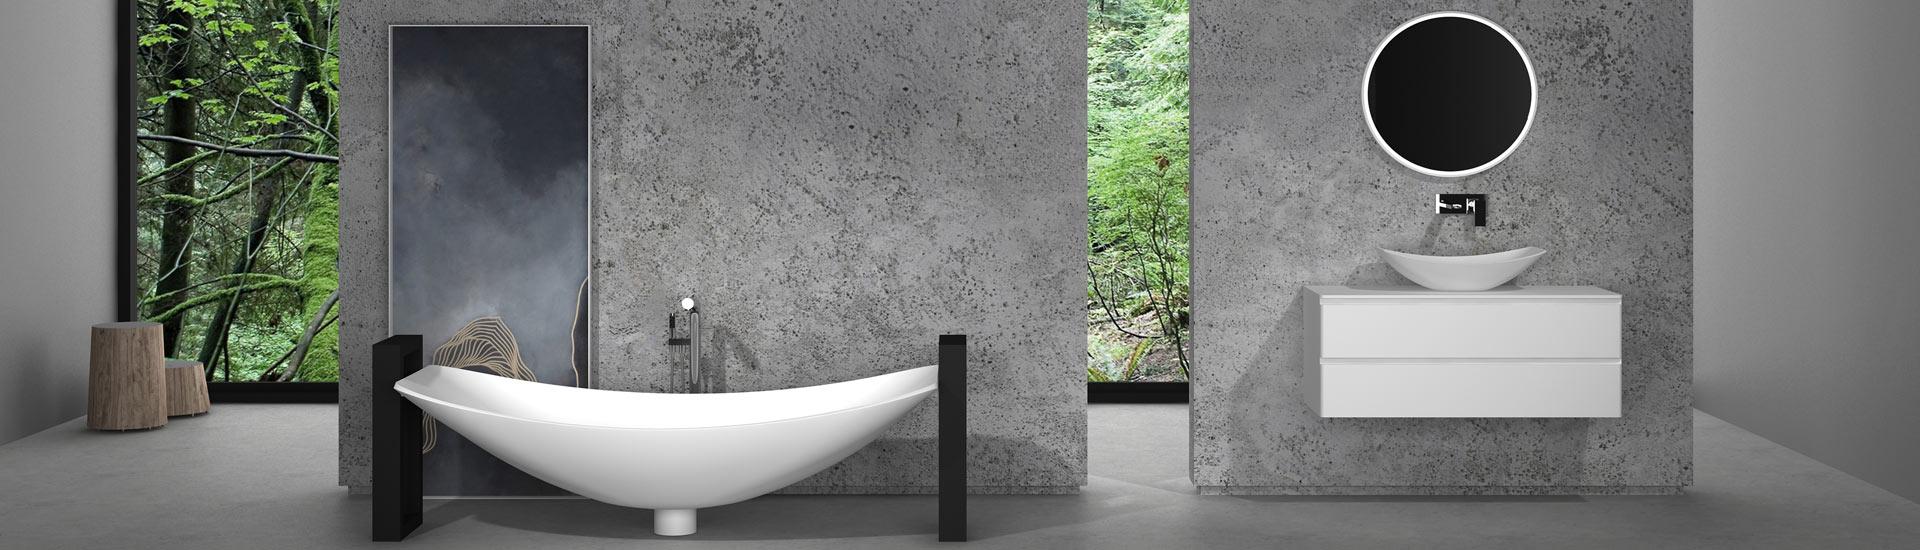 Bathroom with steel framed tub and basin in hammock style